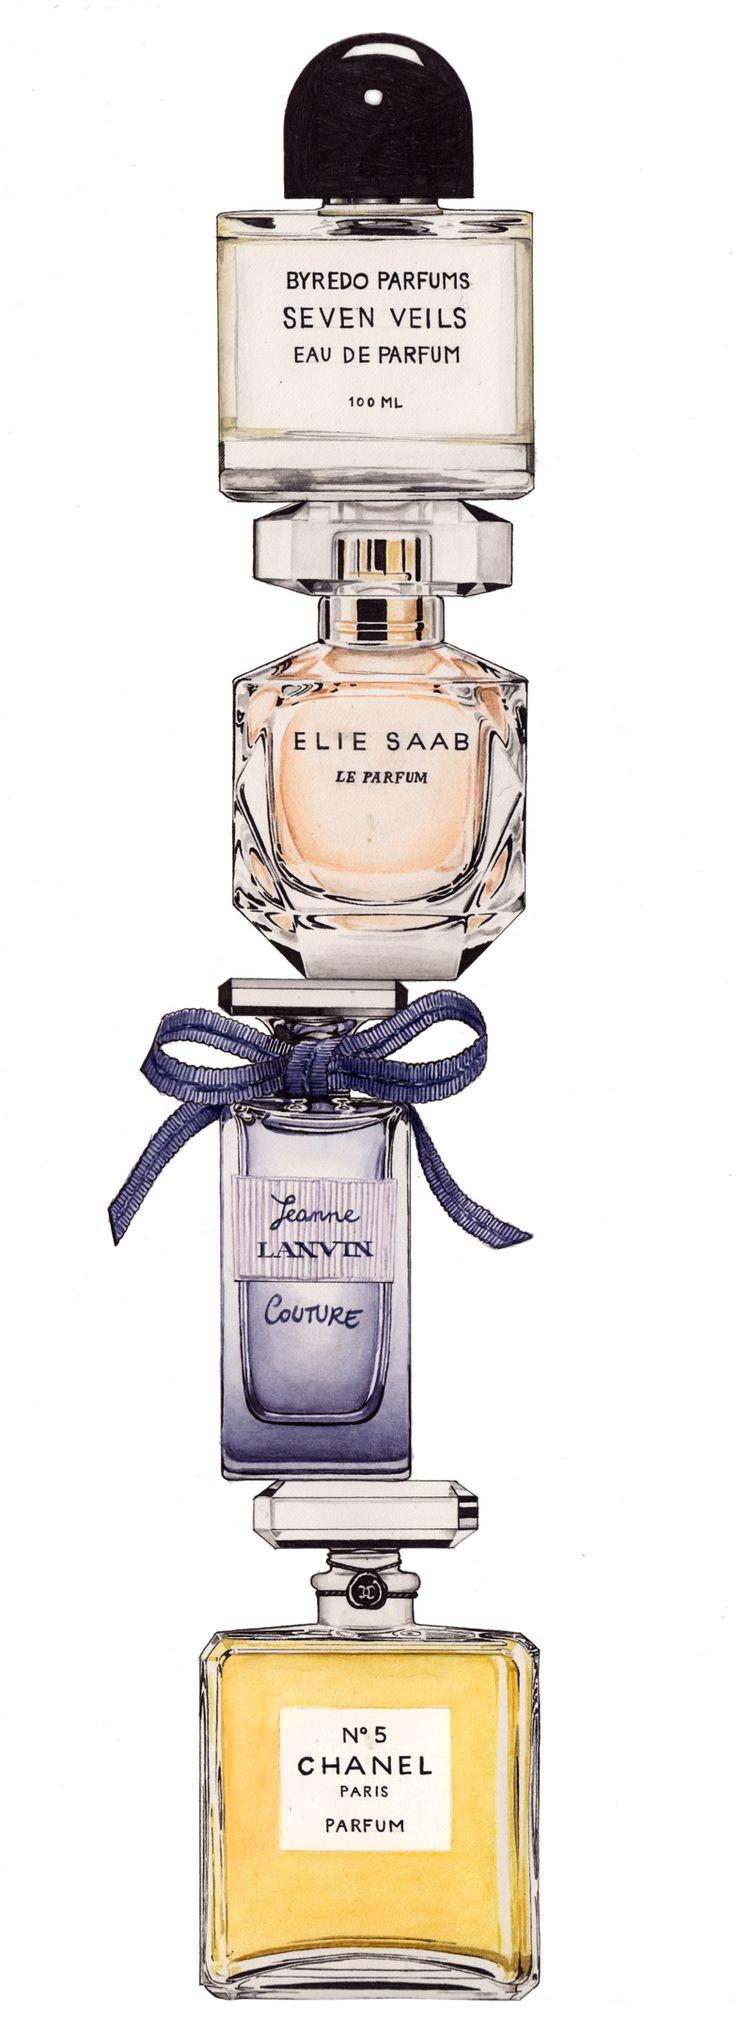 perfume(100dpi) - Myltan at http://loudmajor.com/myltan/